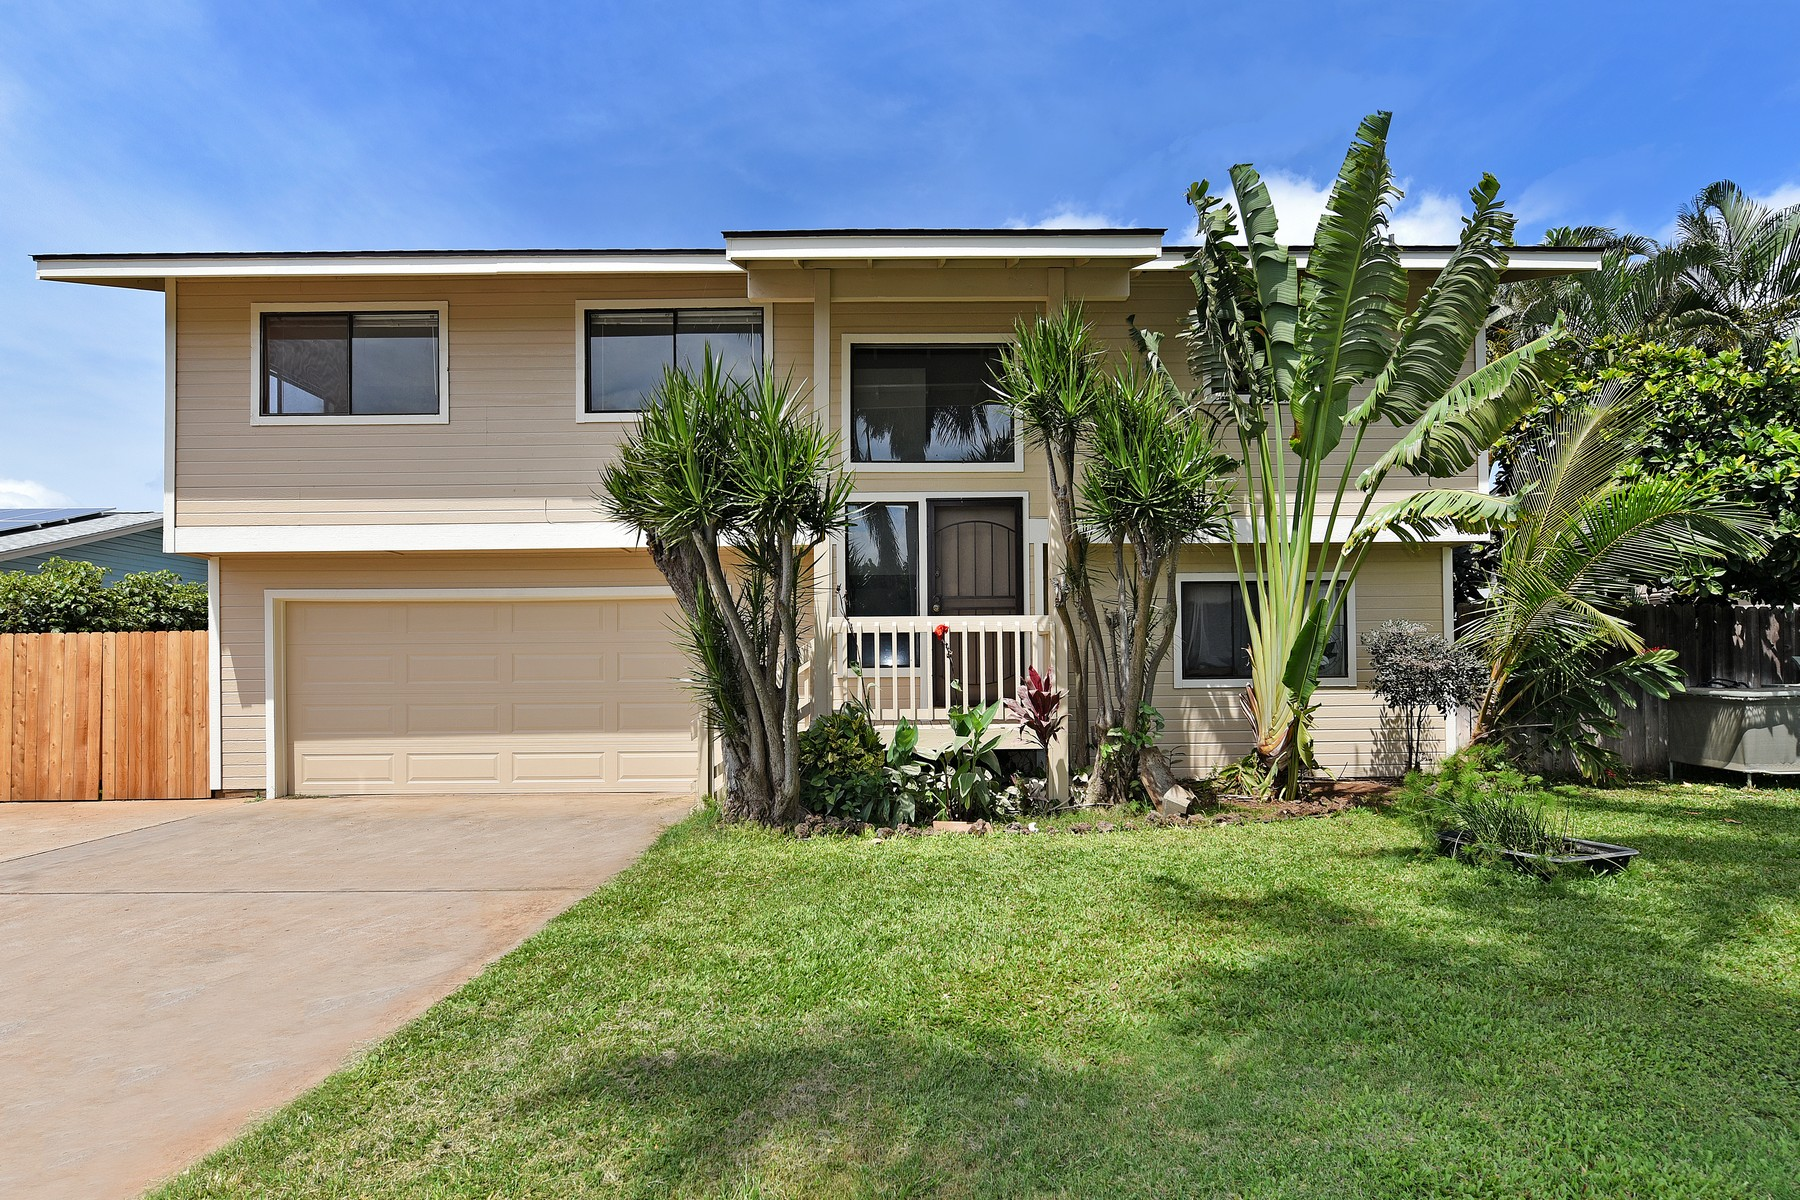 Multi-Family Home for Sale at Great Kihei House with Ohana 41 Alania Pl Kihei, Hawaii 96753 United States